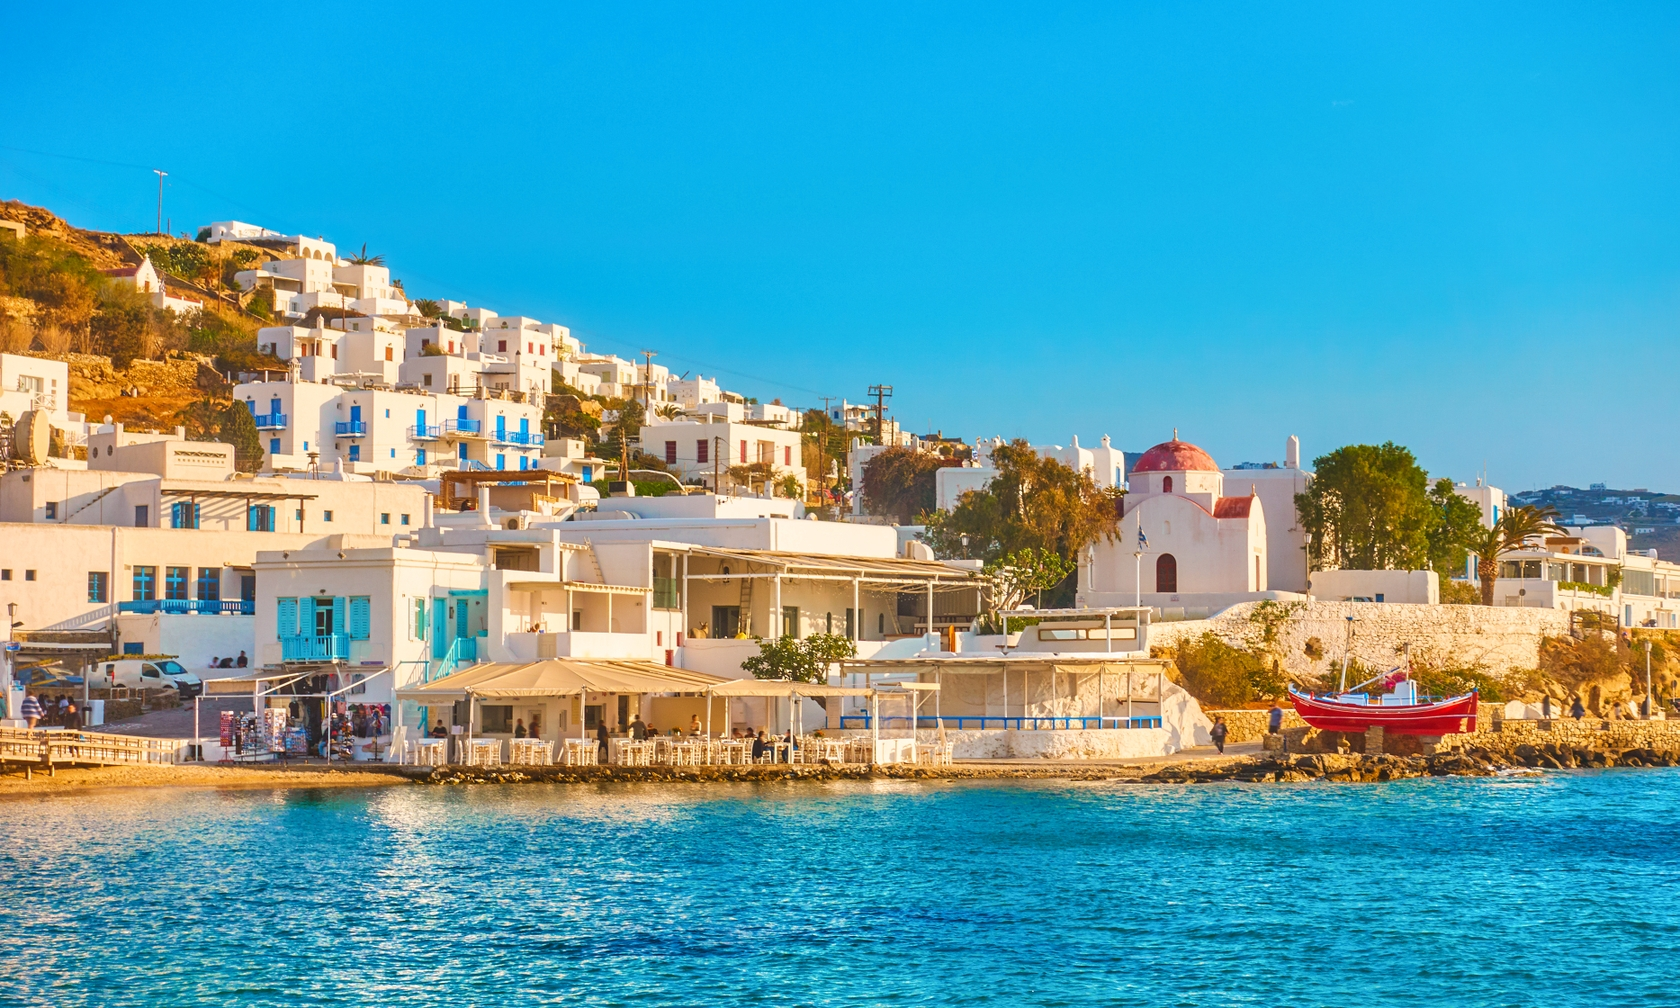 Villa and house rentals in Mykonos